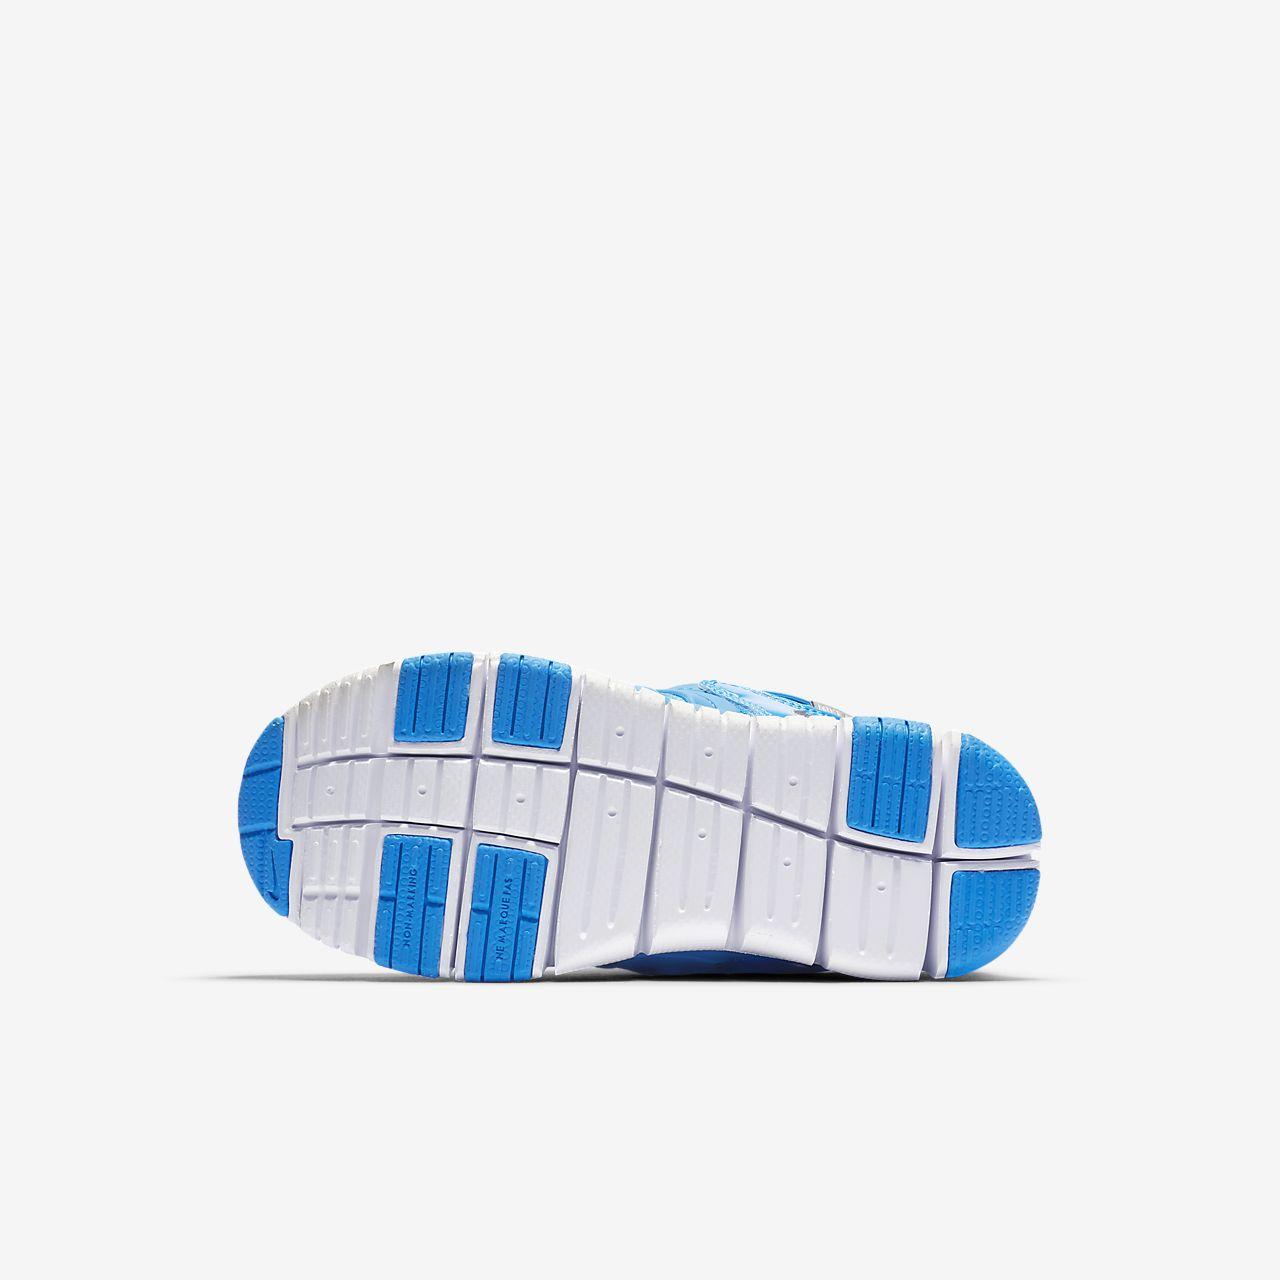 f277f767 Calzado para niños de talla pequeña Nike Dynamo Free. Nike.com MX